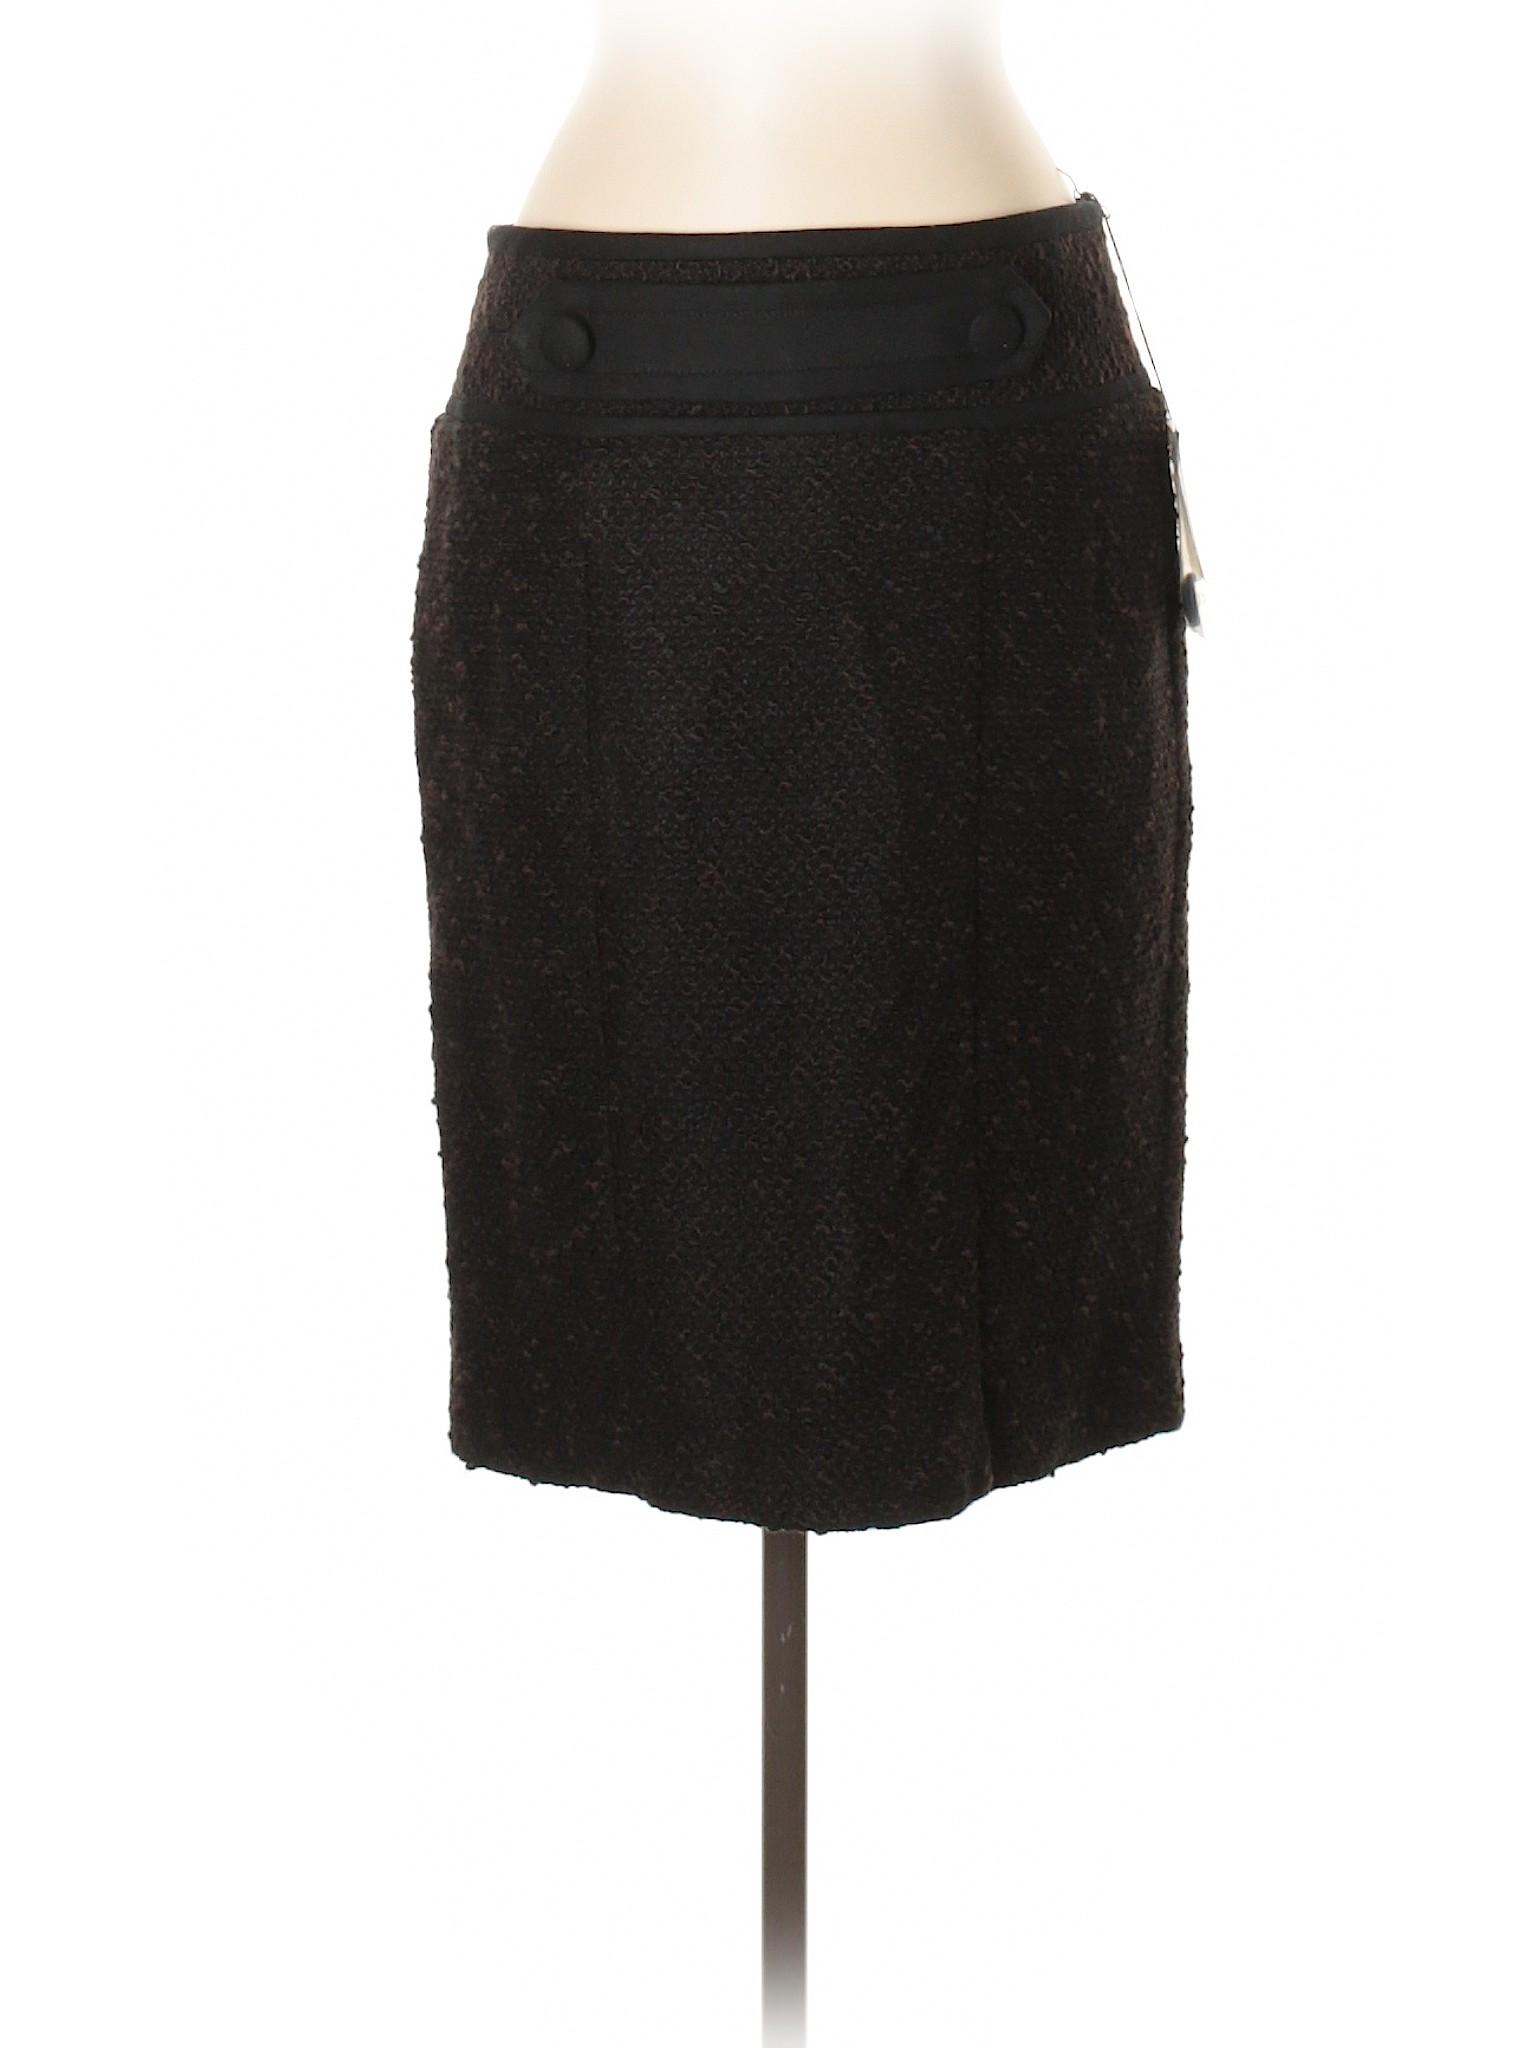 Nanette Boutique Boutique Skirt Lepore Lepore Nanette Formal Skirt Formal ZwqxUCwXS